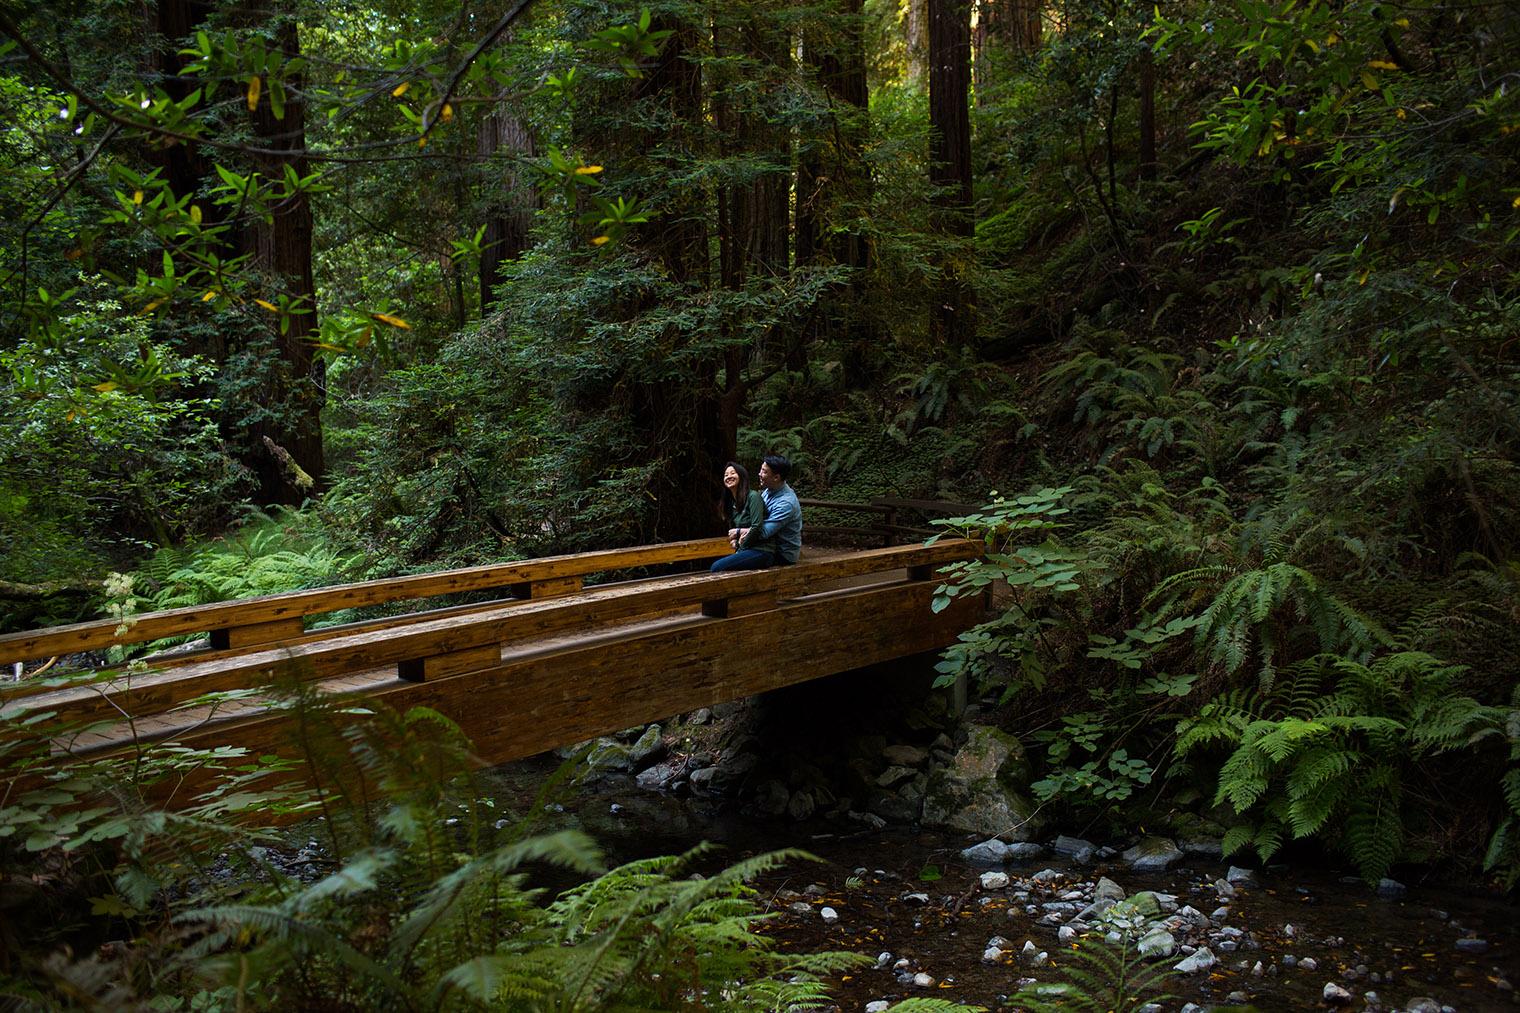 muir woods proposal captured